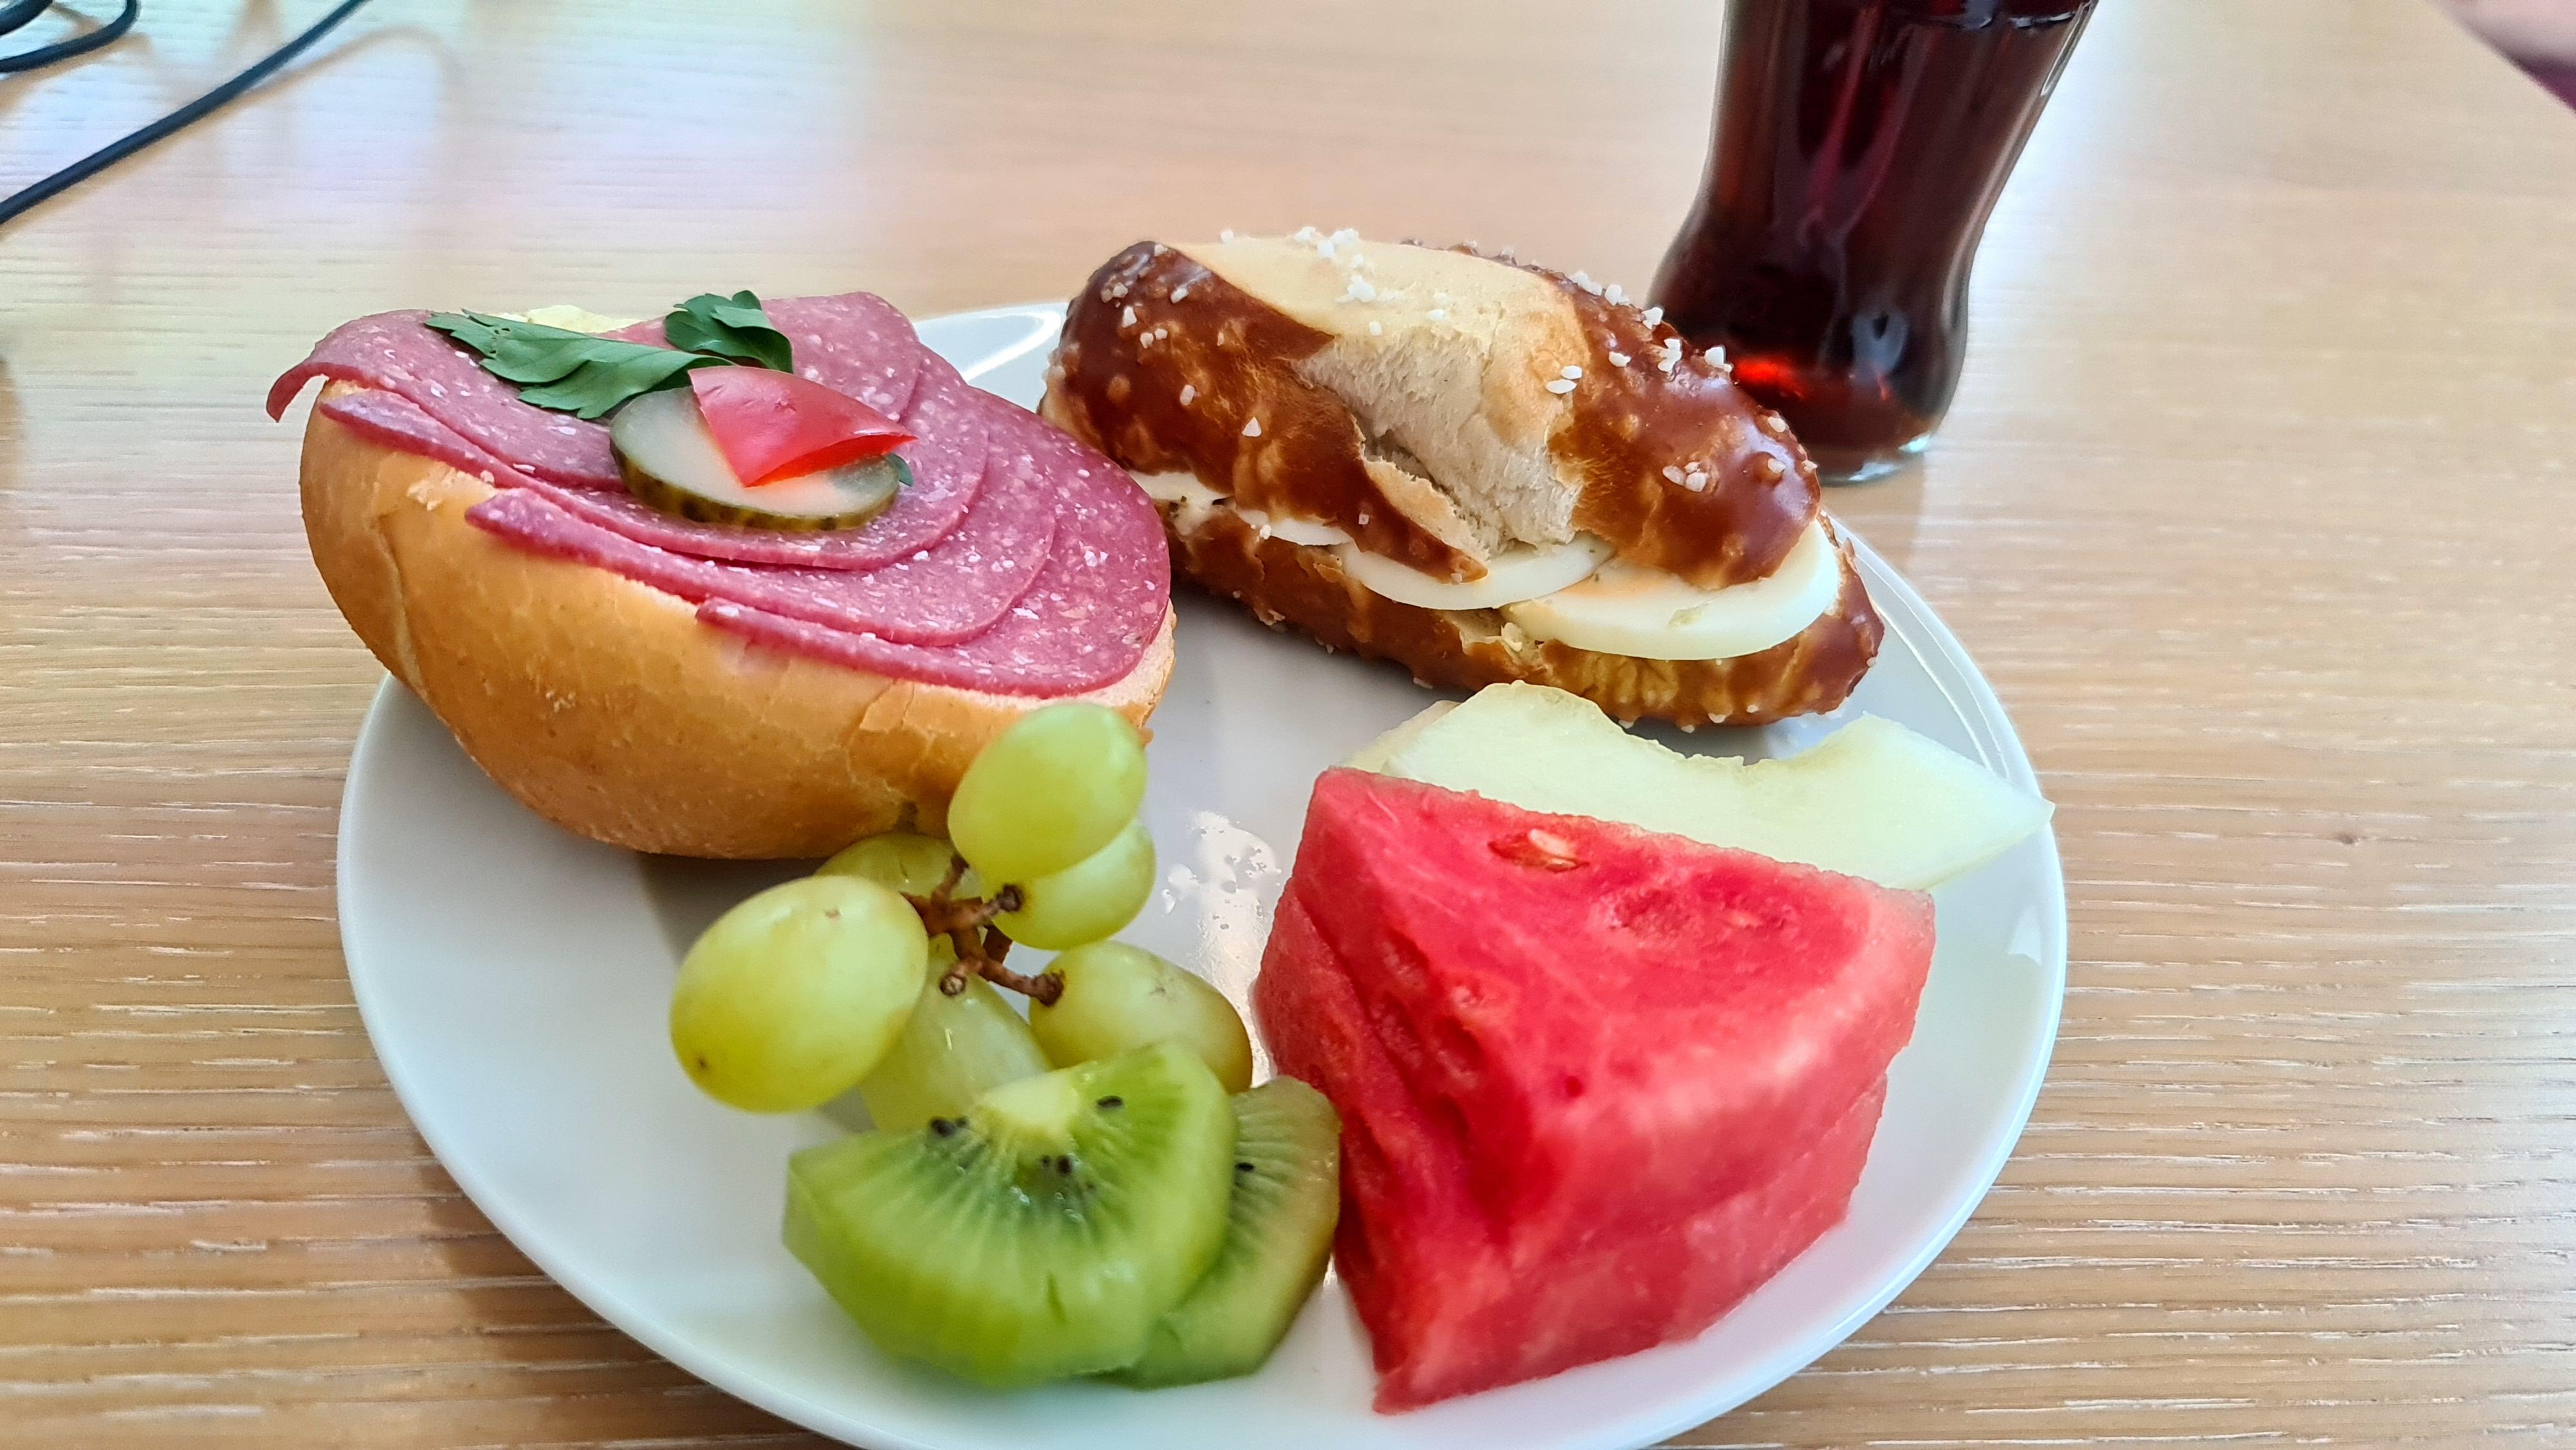 https://foodloader.net/Holz_2020-10-13_Snacks.jpg